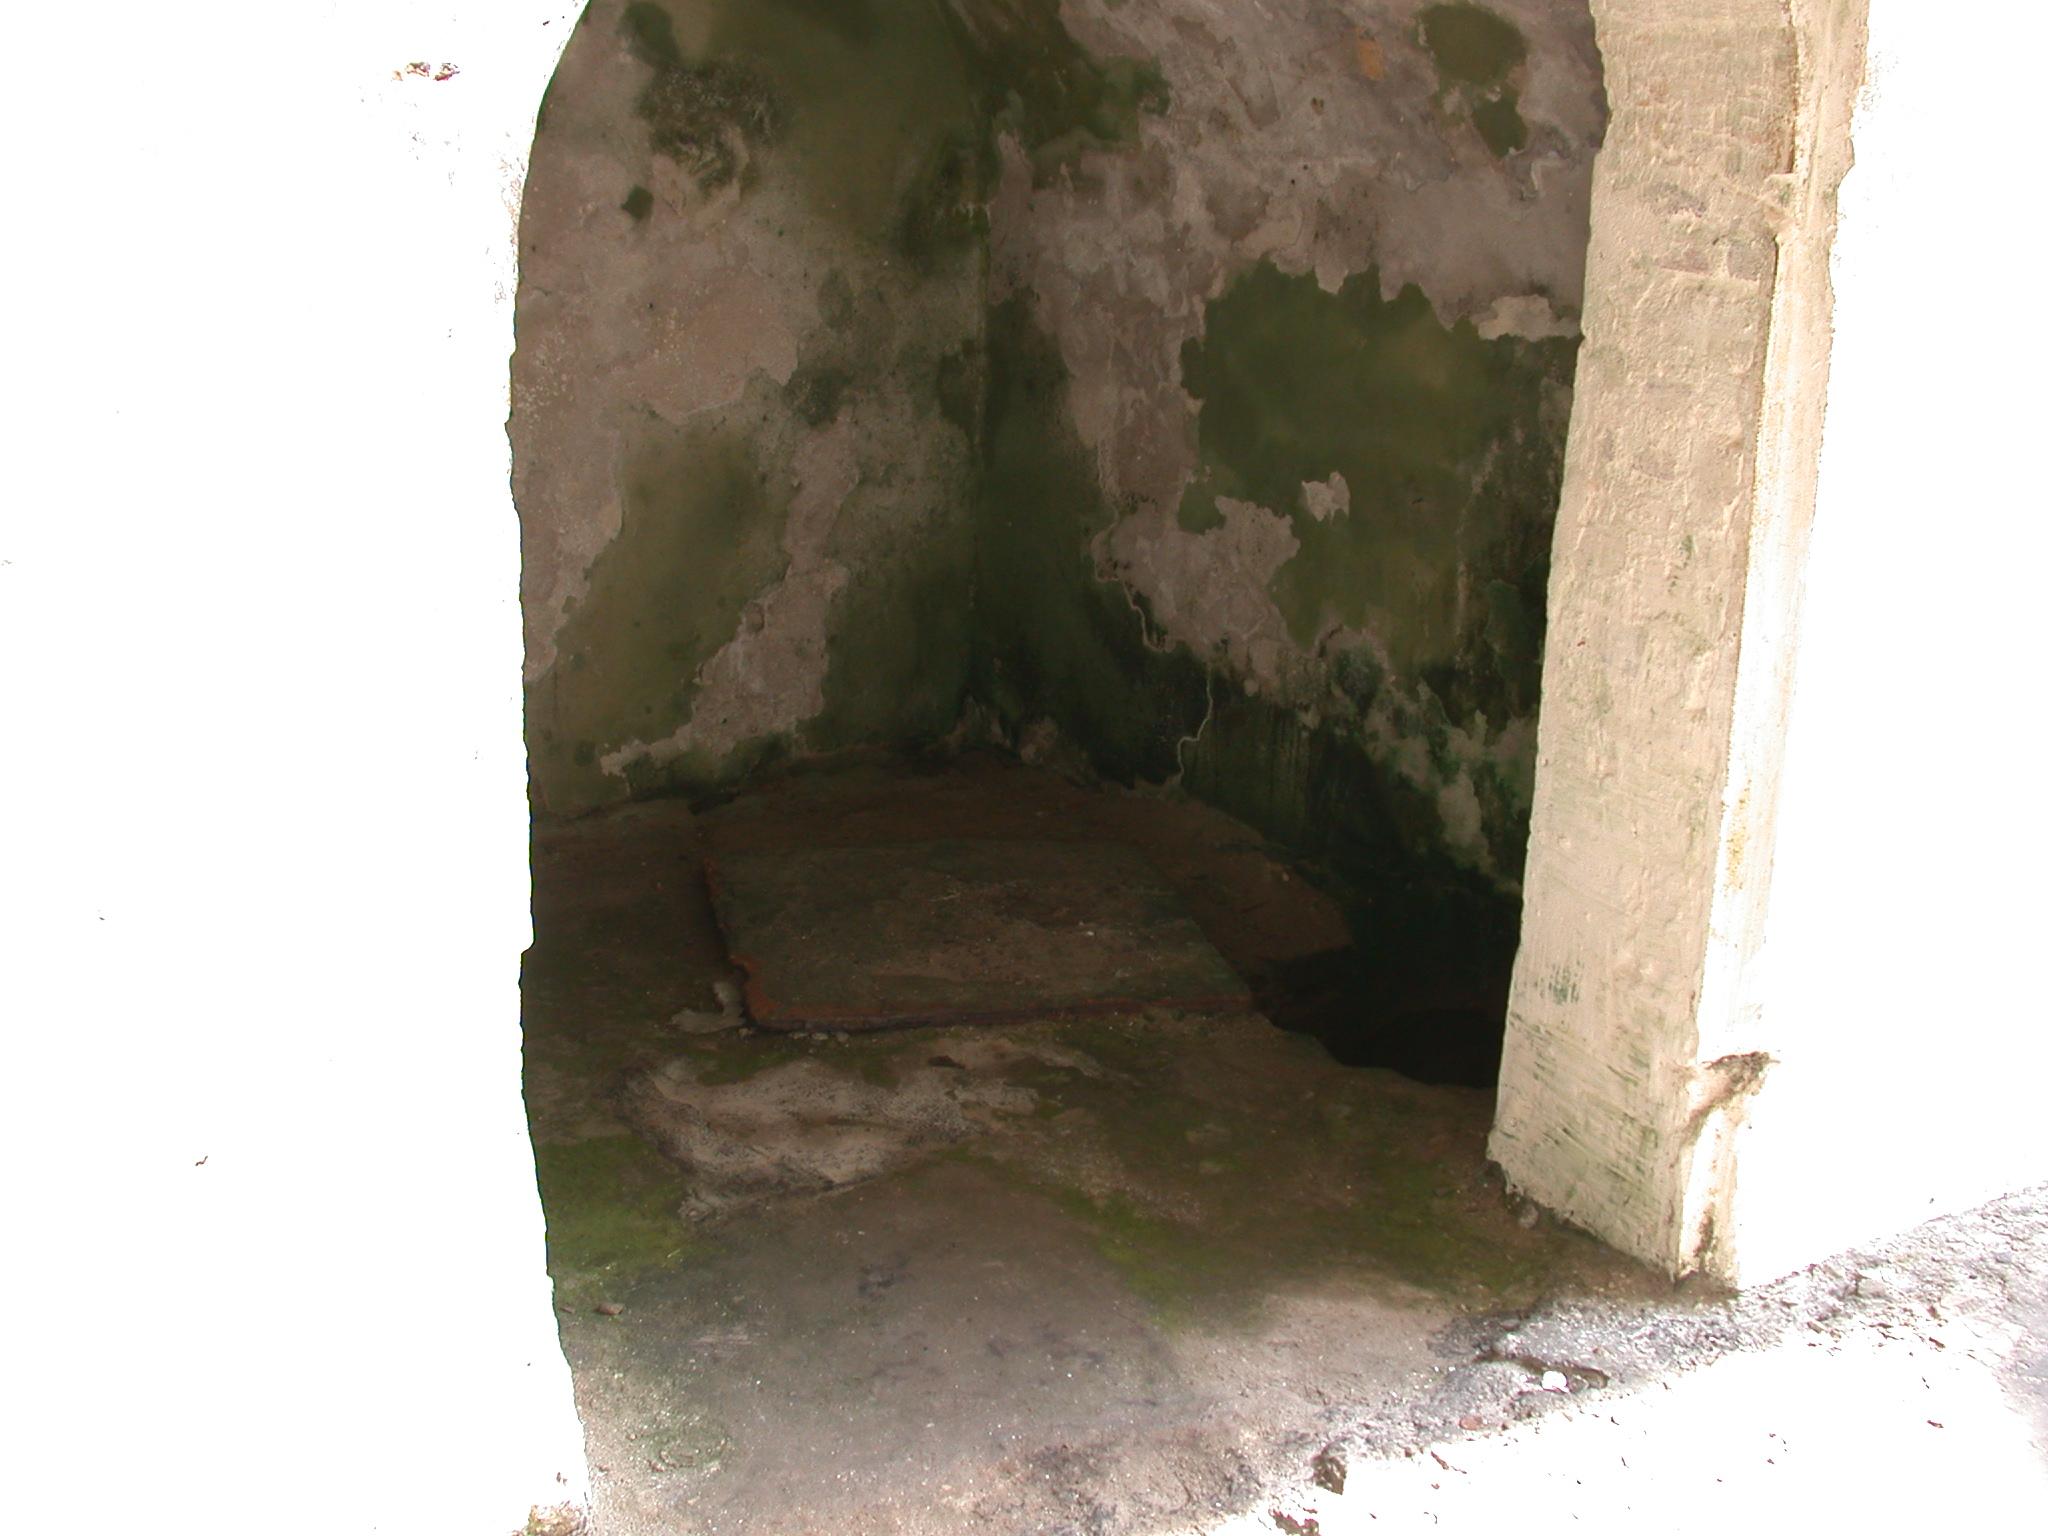 Slave Dungeon, Cape Coast Slave Fort, Cape Coast, Ghana